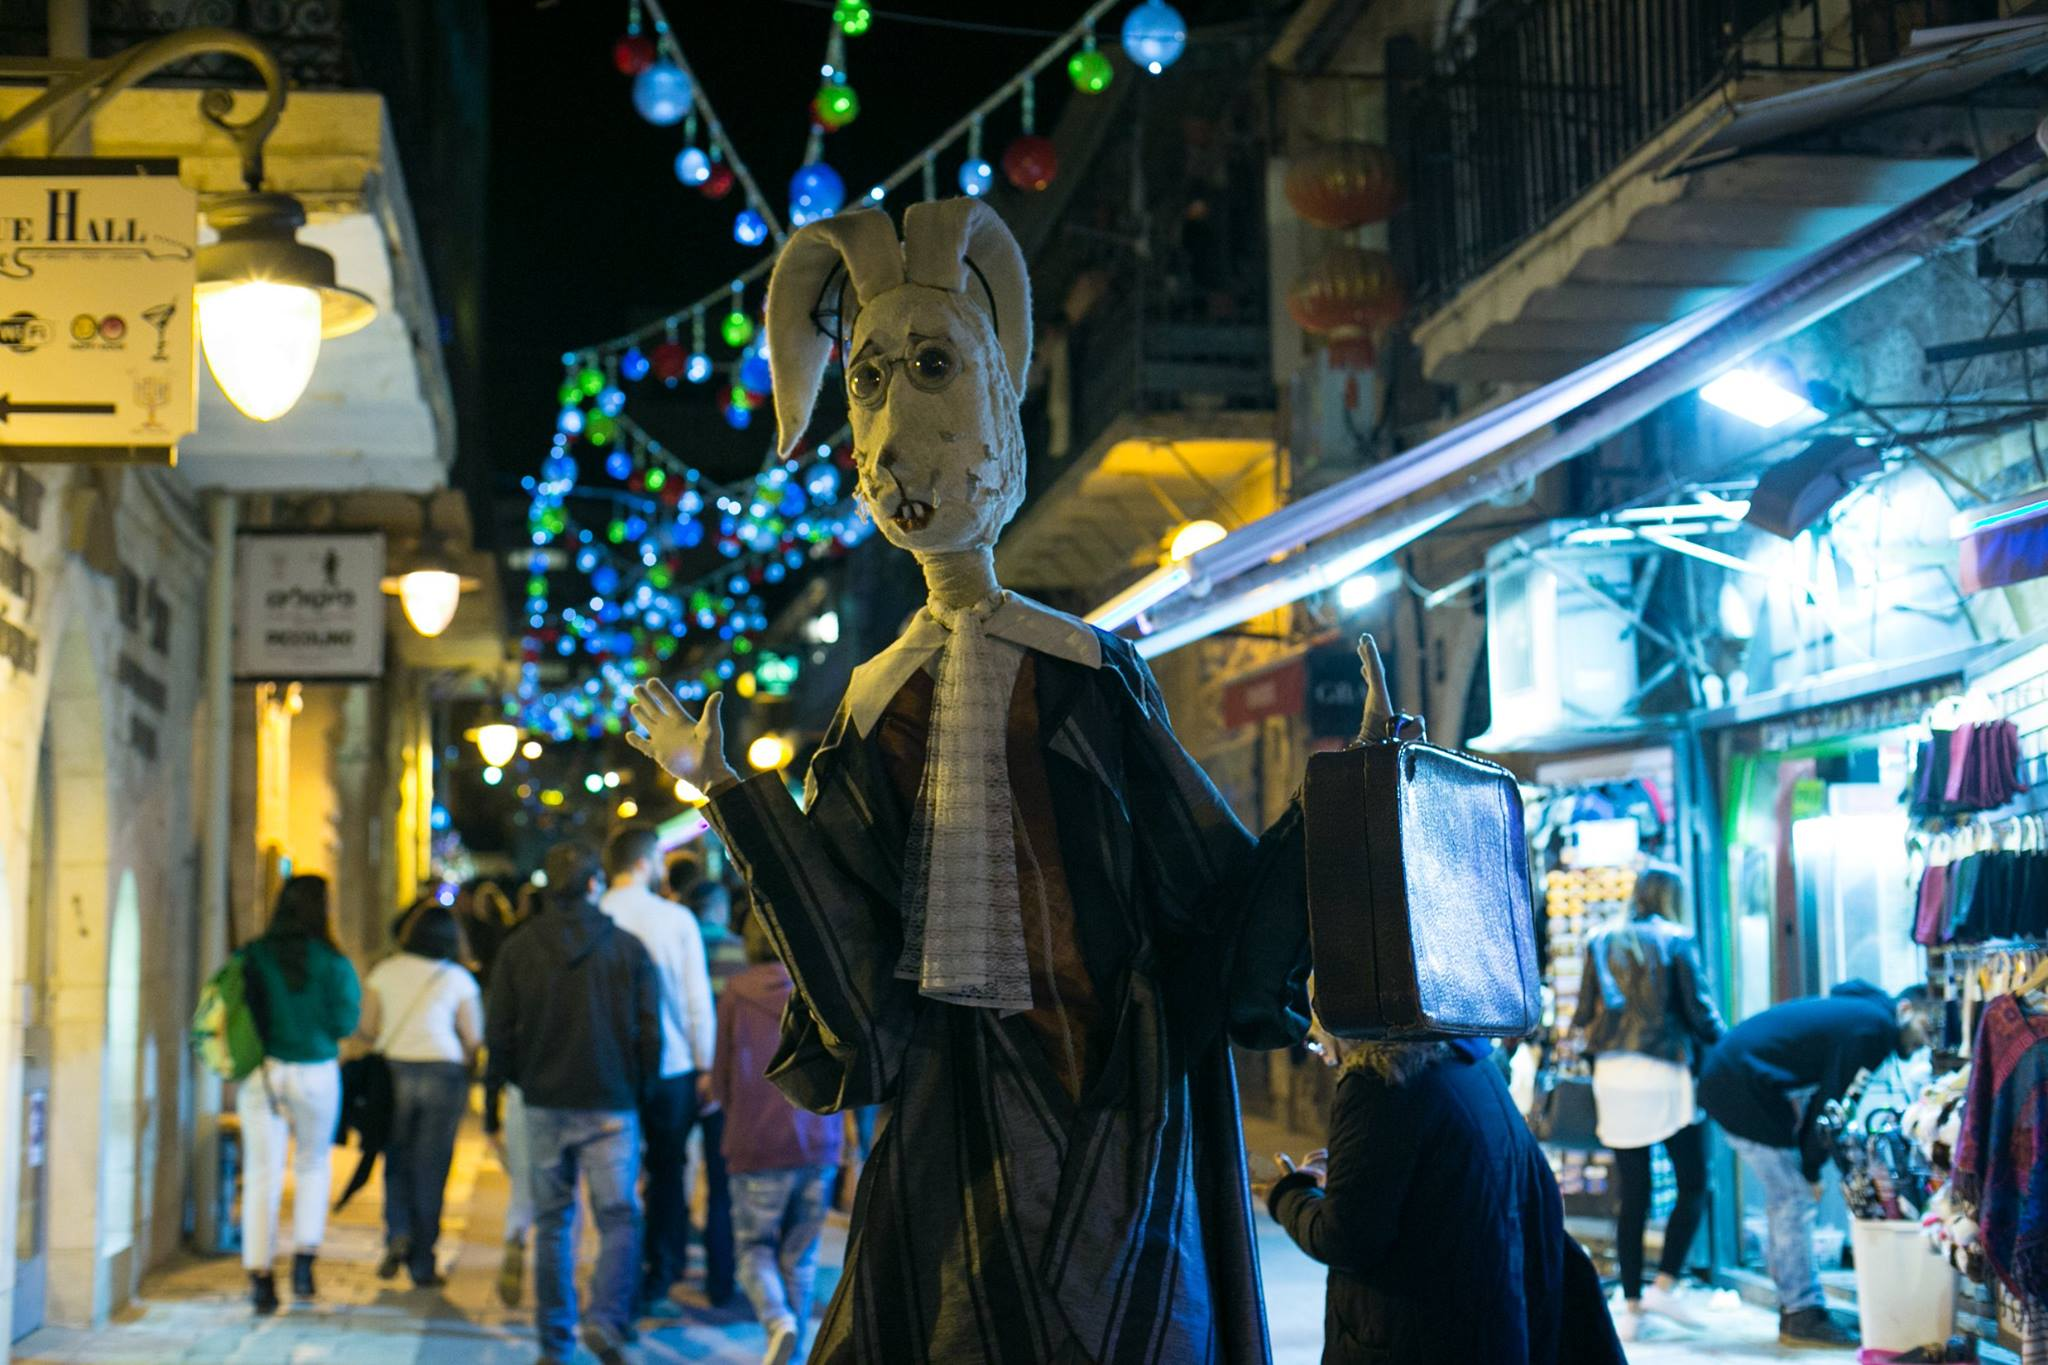 Handmade costume worn by performer at Shaon Horef winter street festival in Jerusalem